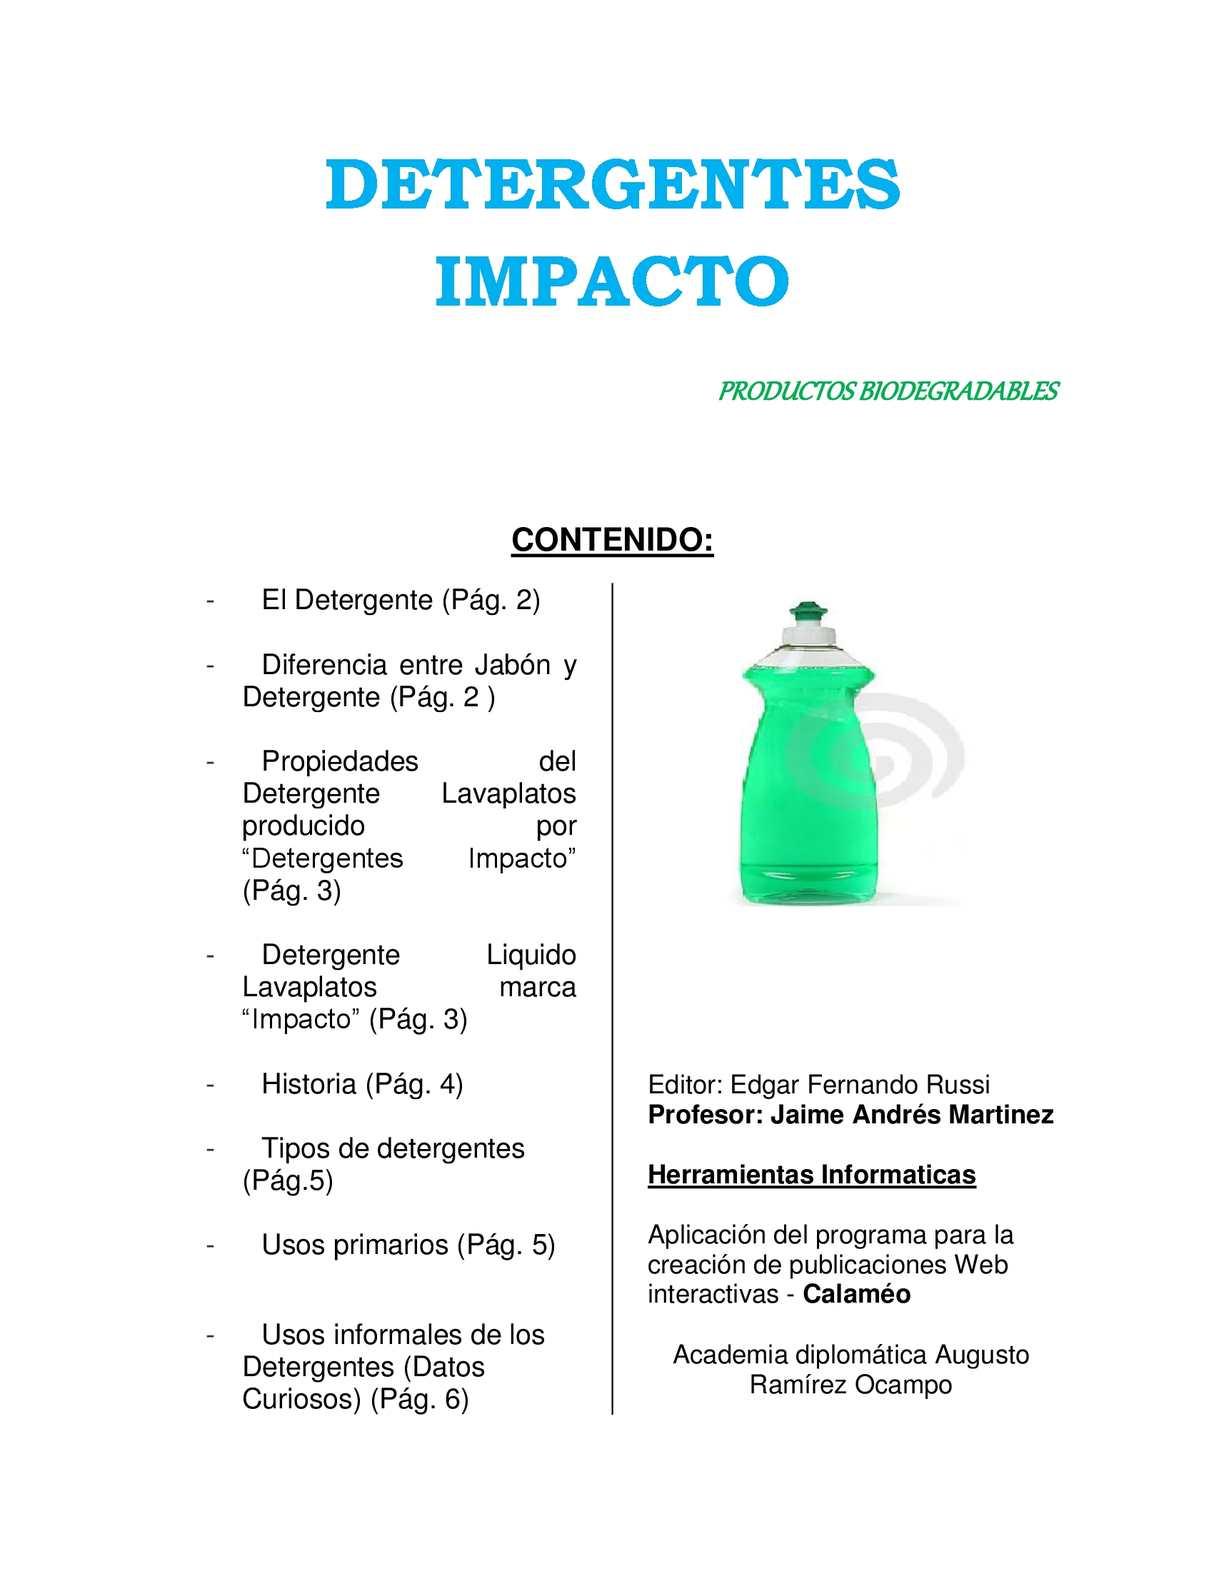 Calam o detergentes impacto for Formula quimica del aceite de cocina